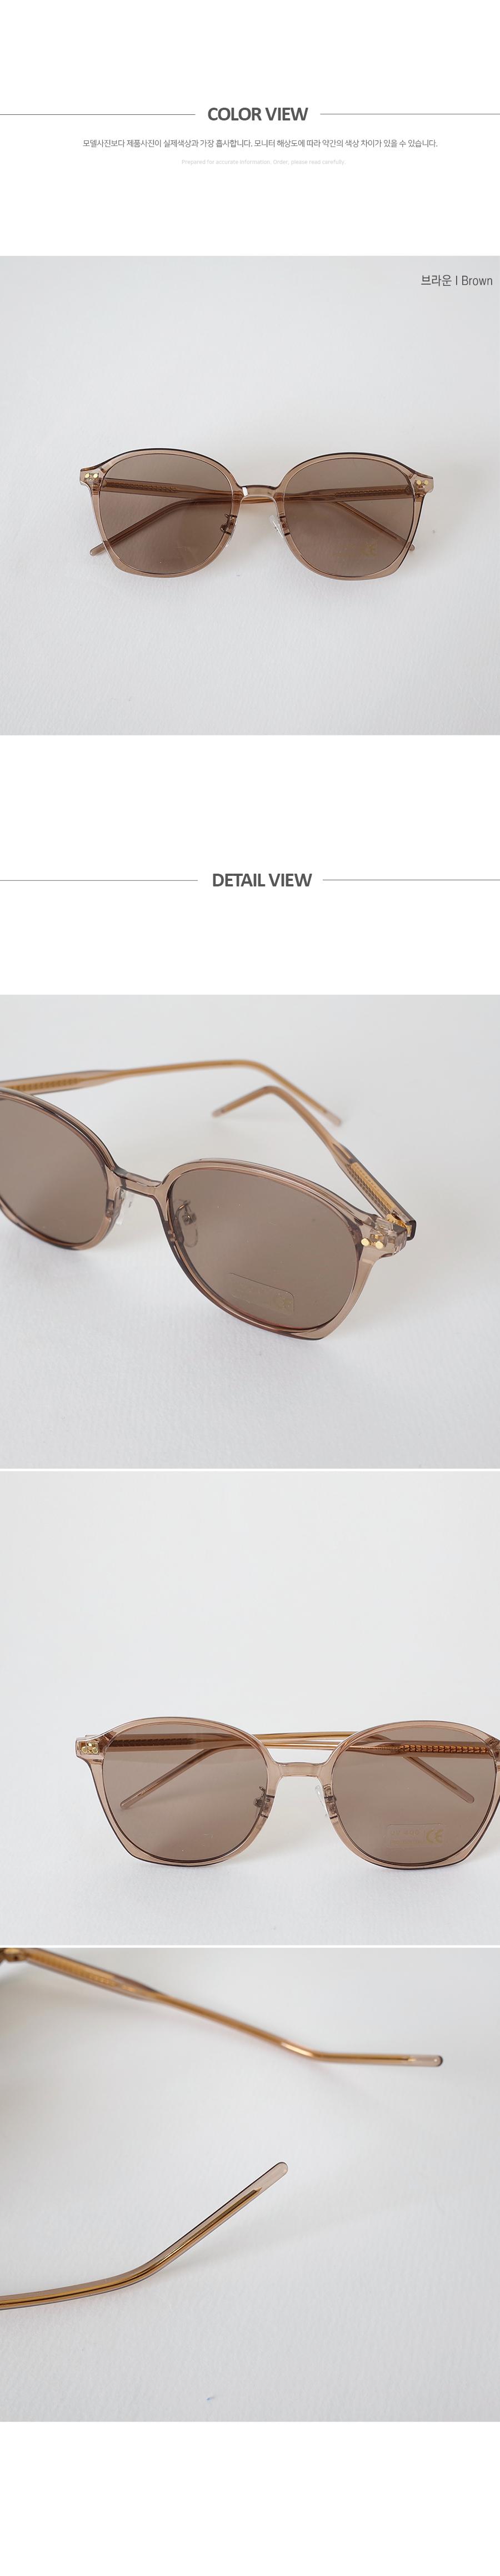 High-quality brown sunglasses